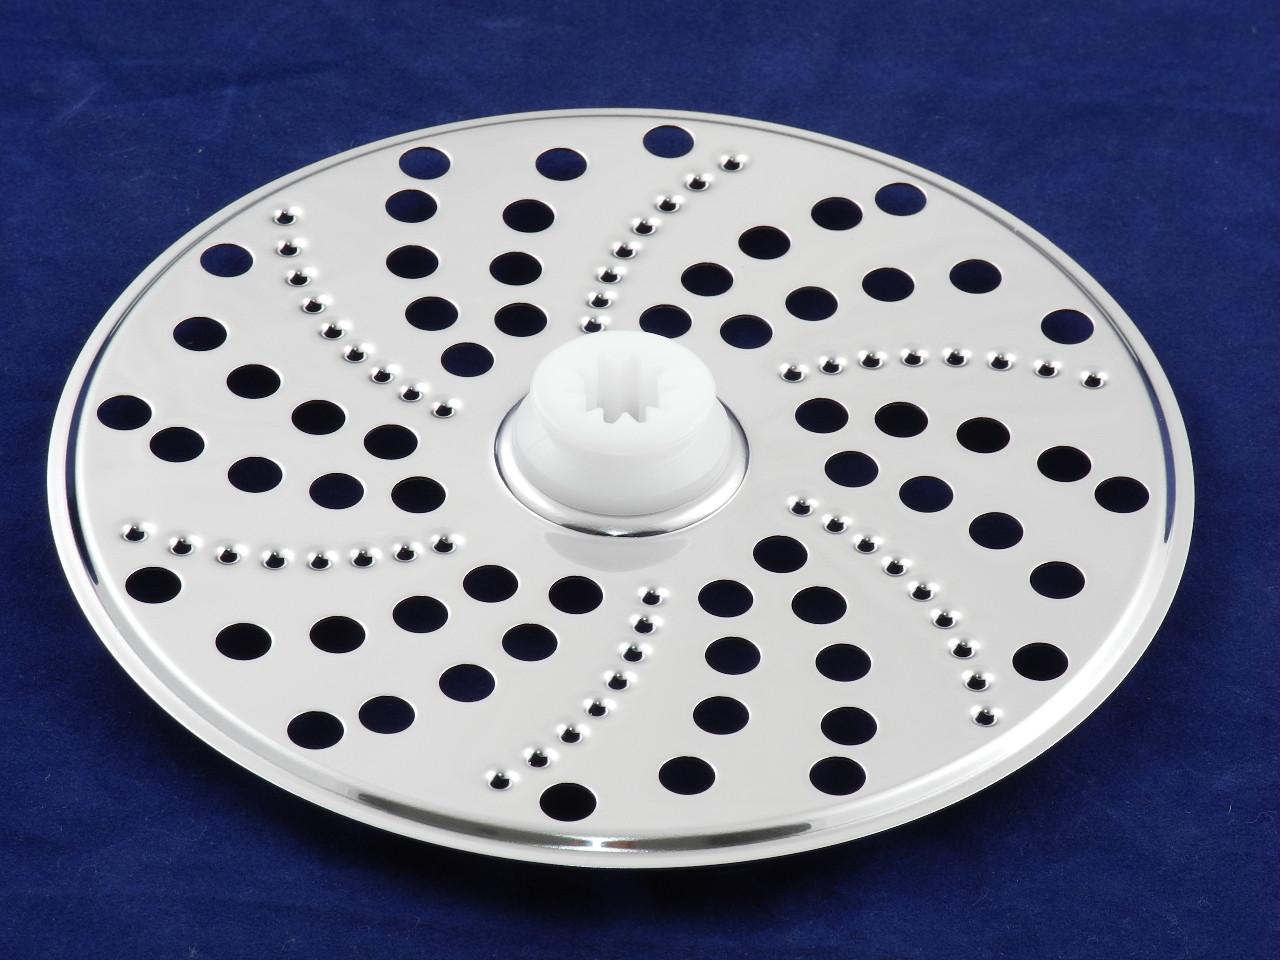 Диск-тёрка крупная (для драников) кухонного комбайна KENWOOD (KW714216), (KW666531)